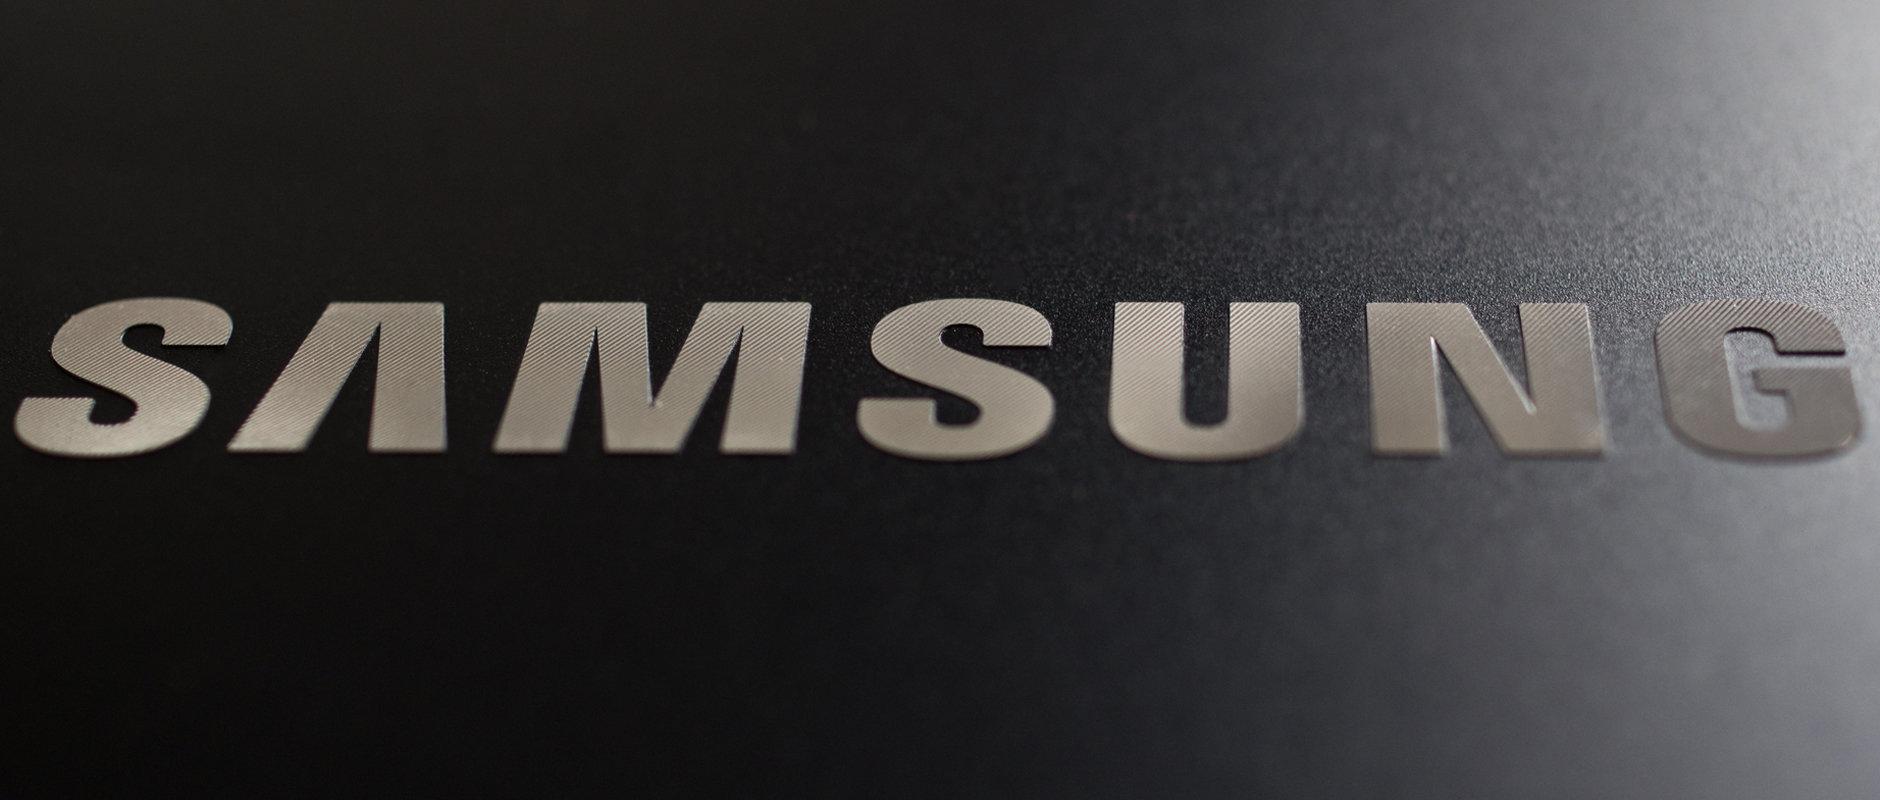 A photograph of the Samsung ATIV Book 9 2014 Edition's branding.